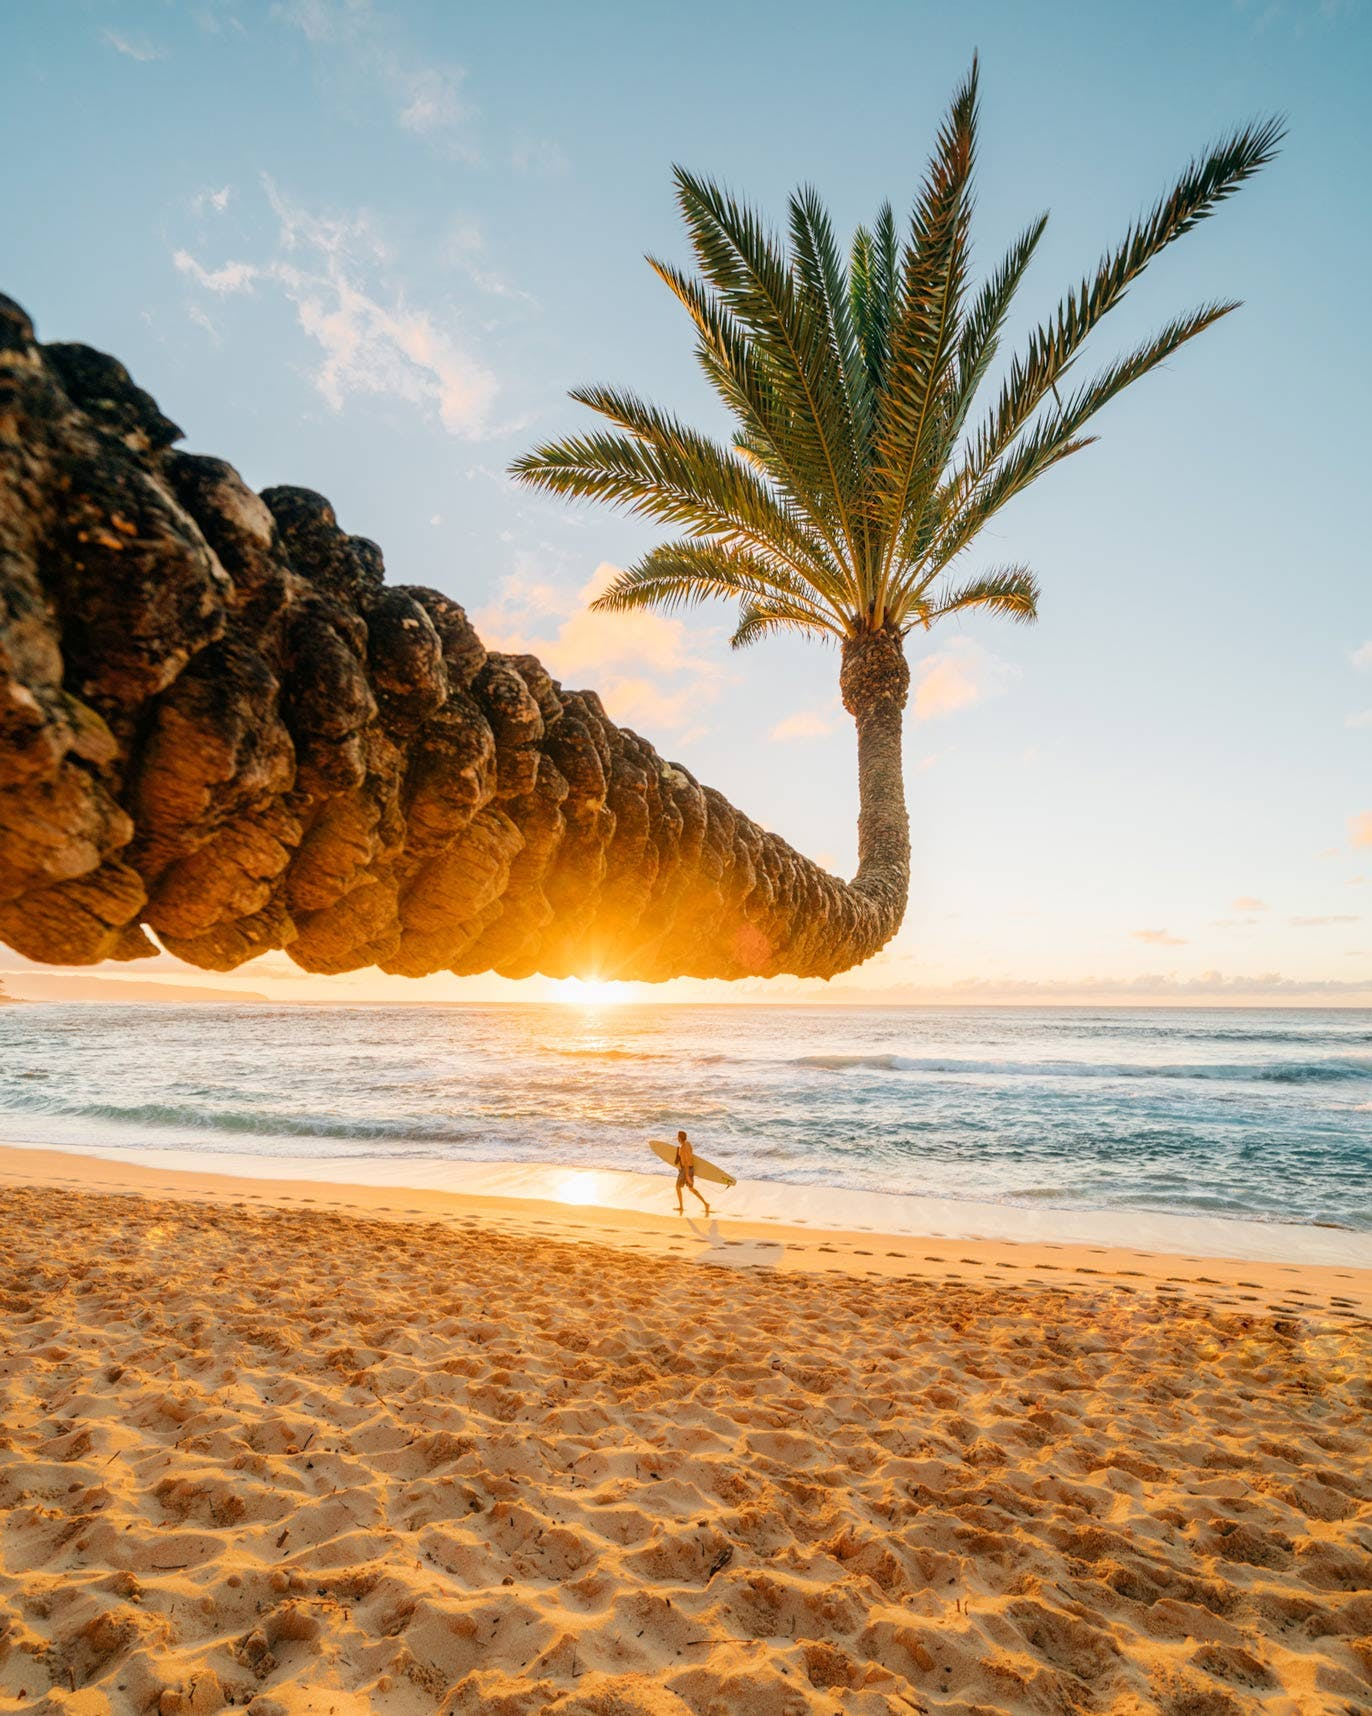 Sunset Beach Crooked Palm Tree